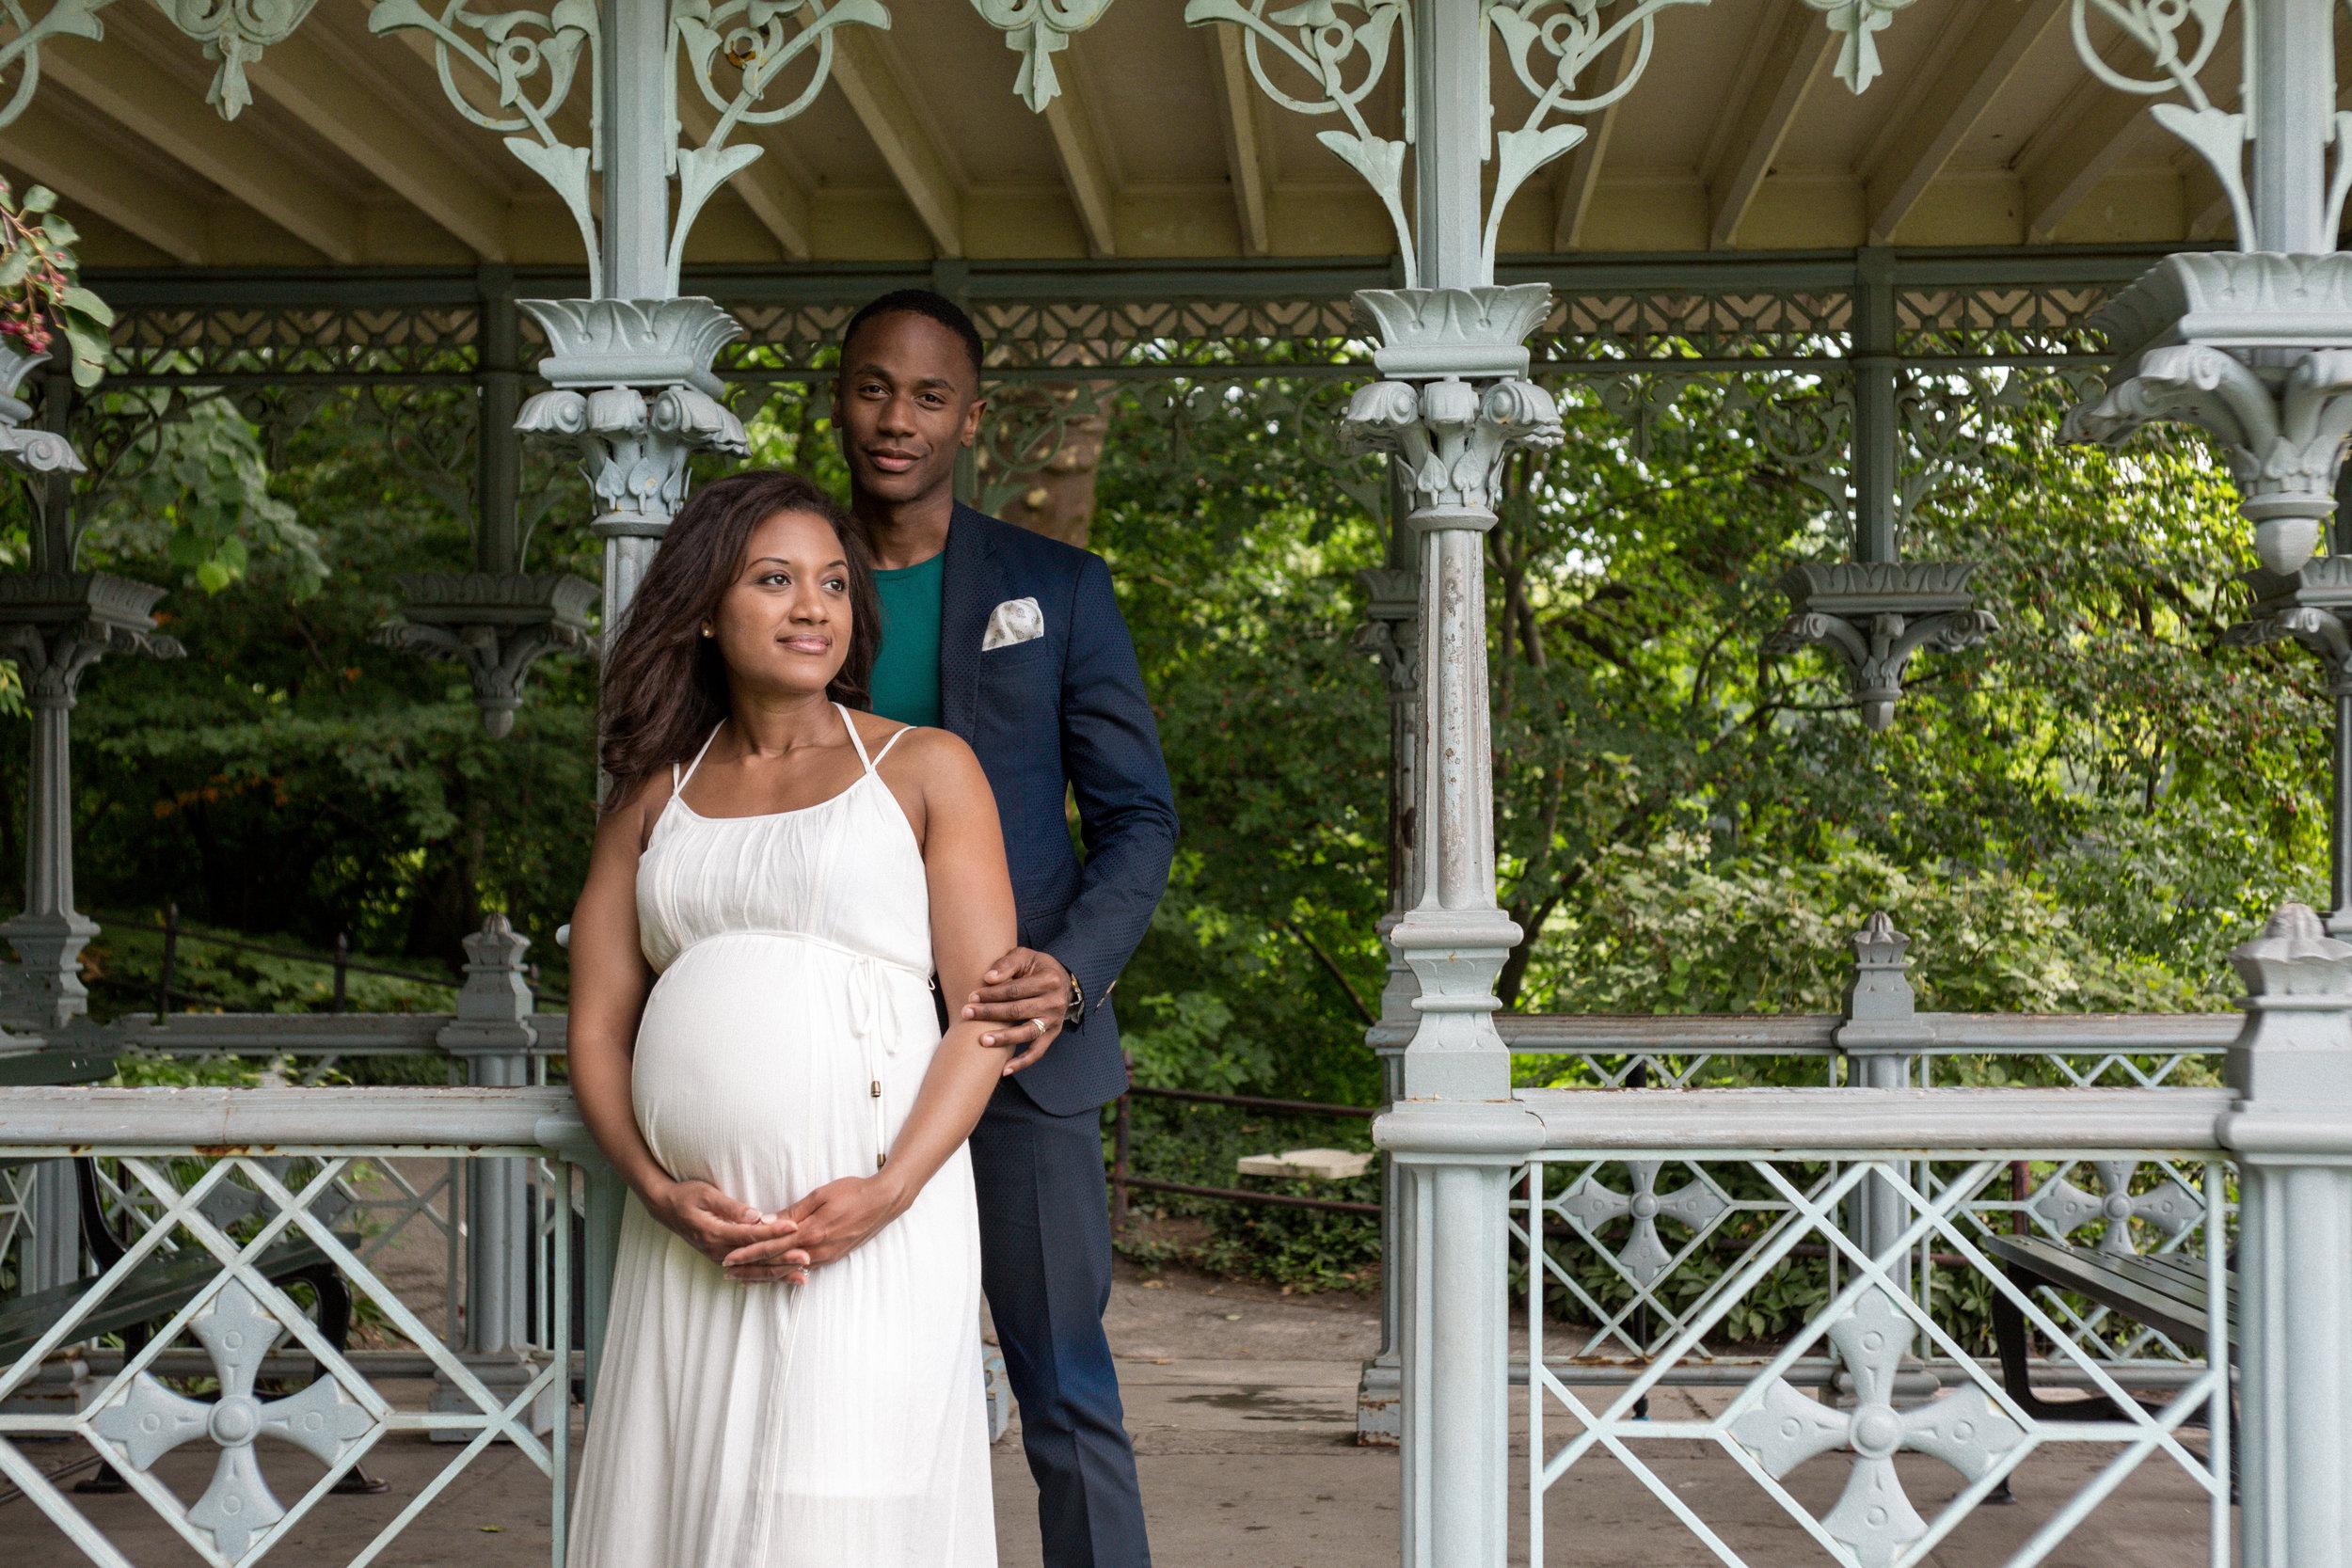 ssp maternity shoot 2a.jpg